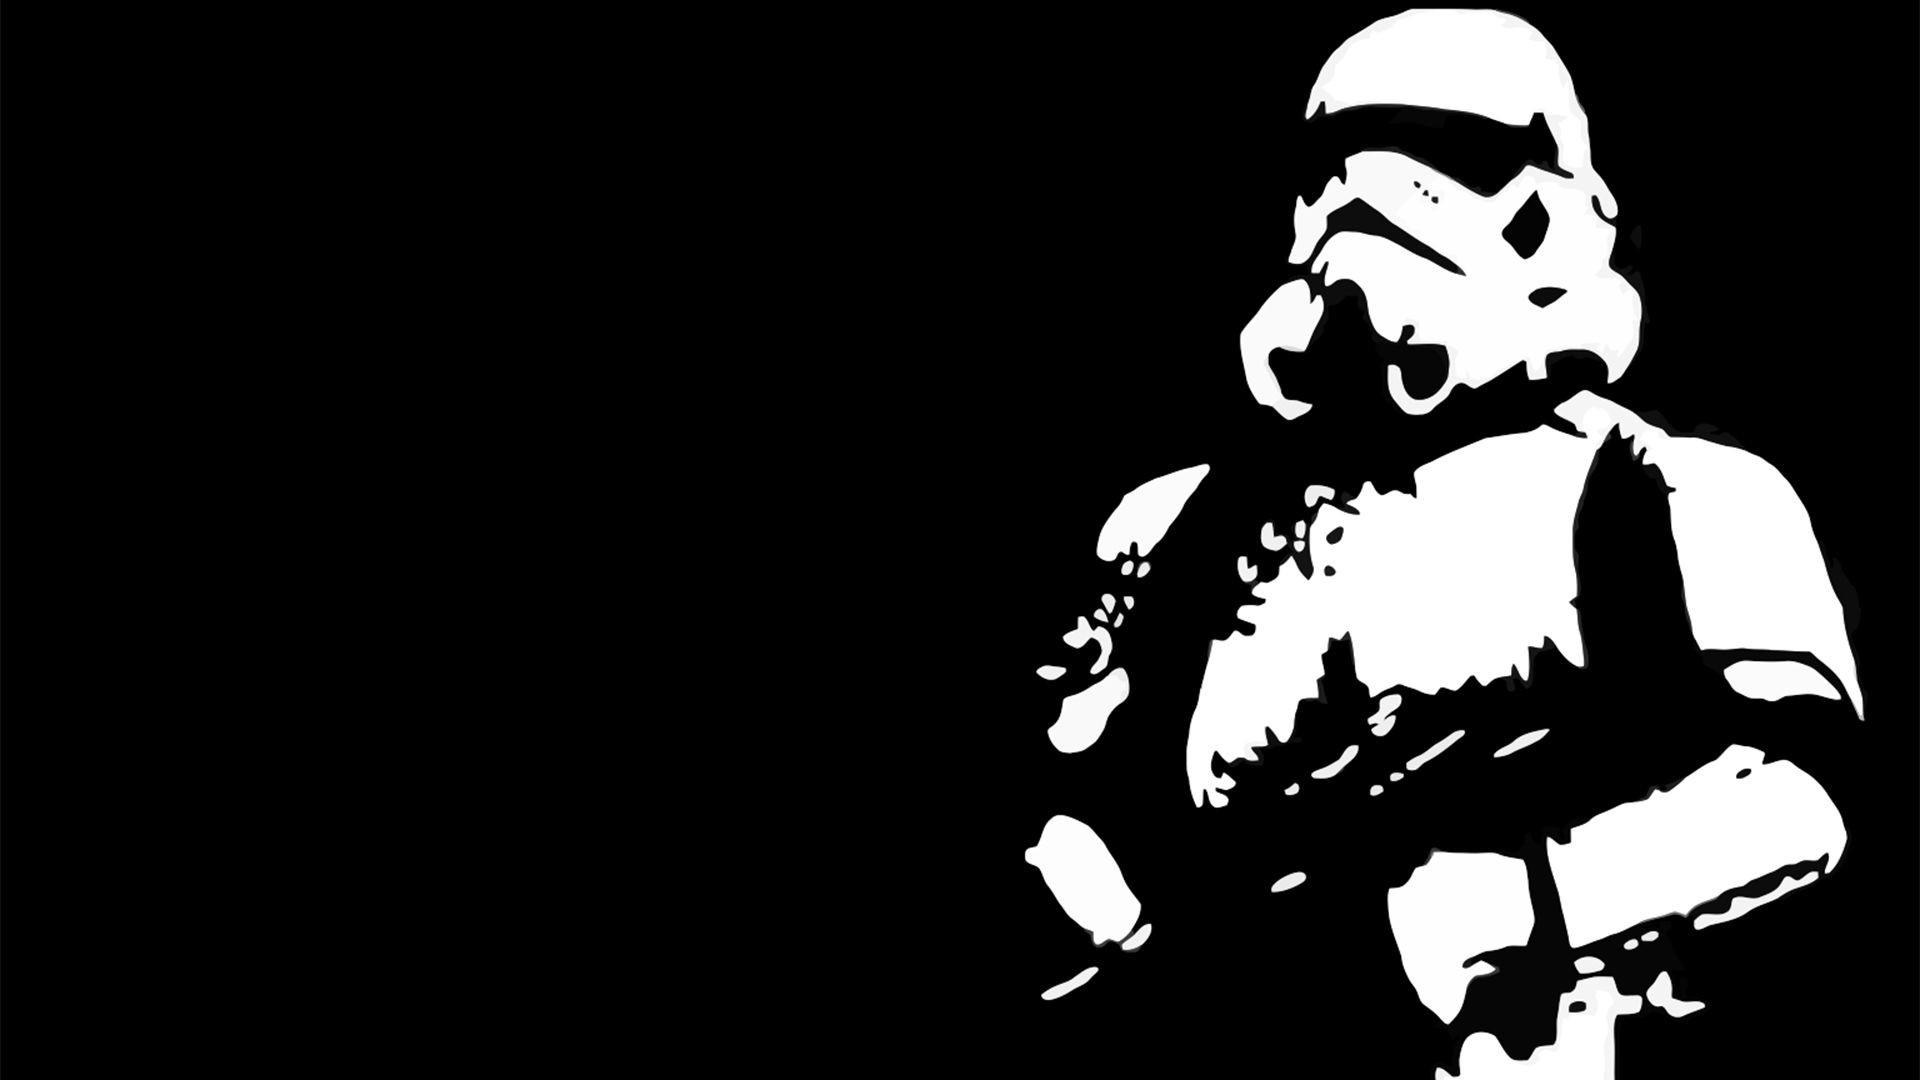 HDQ-Star Wars HD 2016 High Resolution